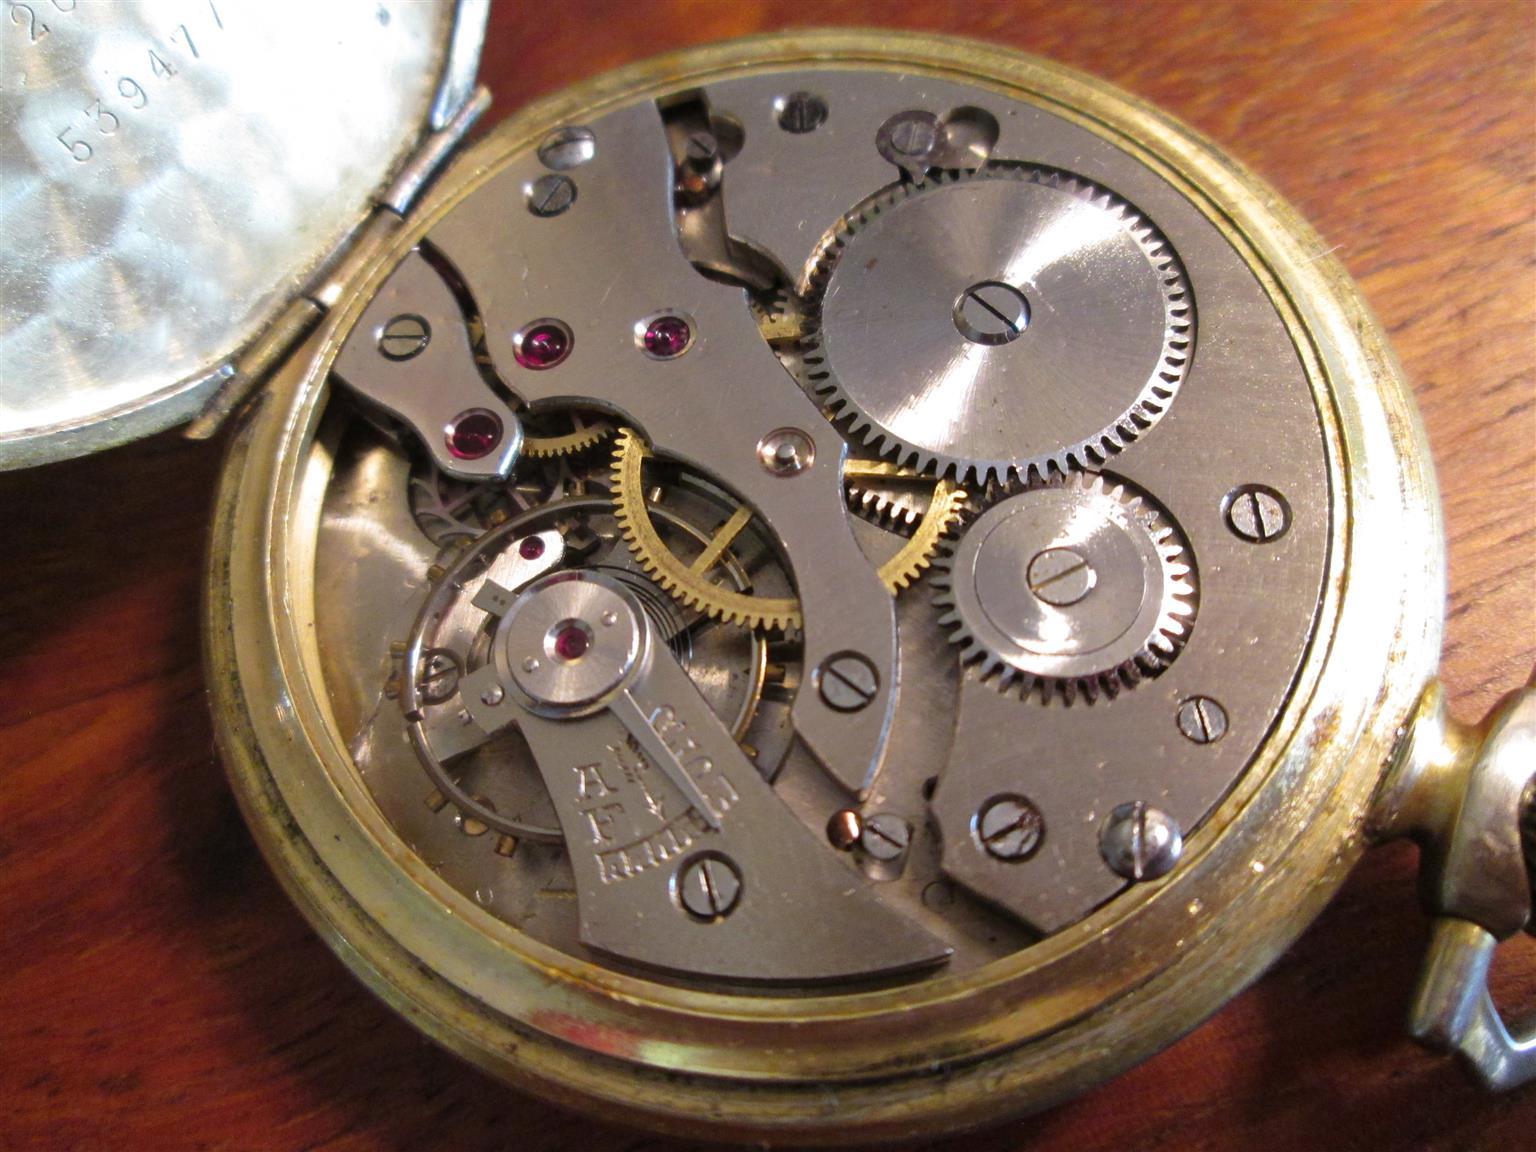 Vintage, antique SWISS MADE AVIA pocket watch, mechanical movement, works fine, timepiece